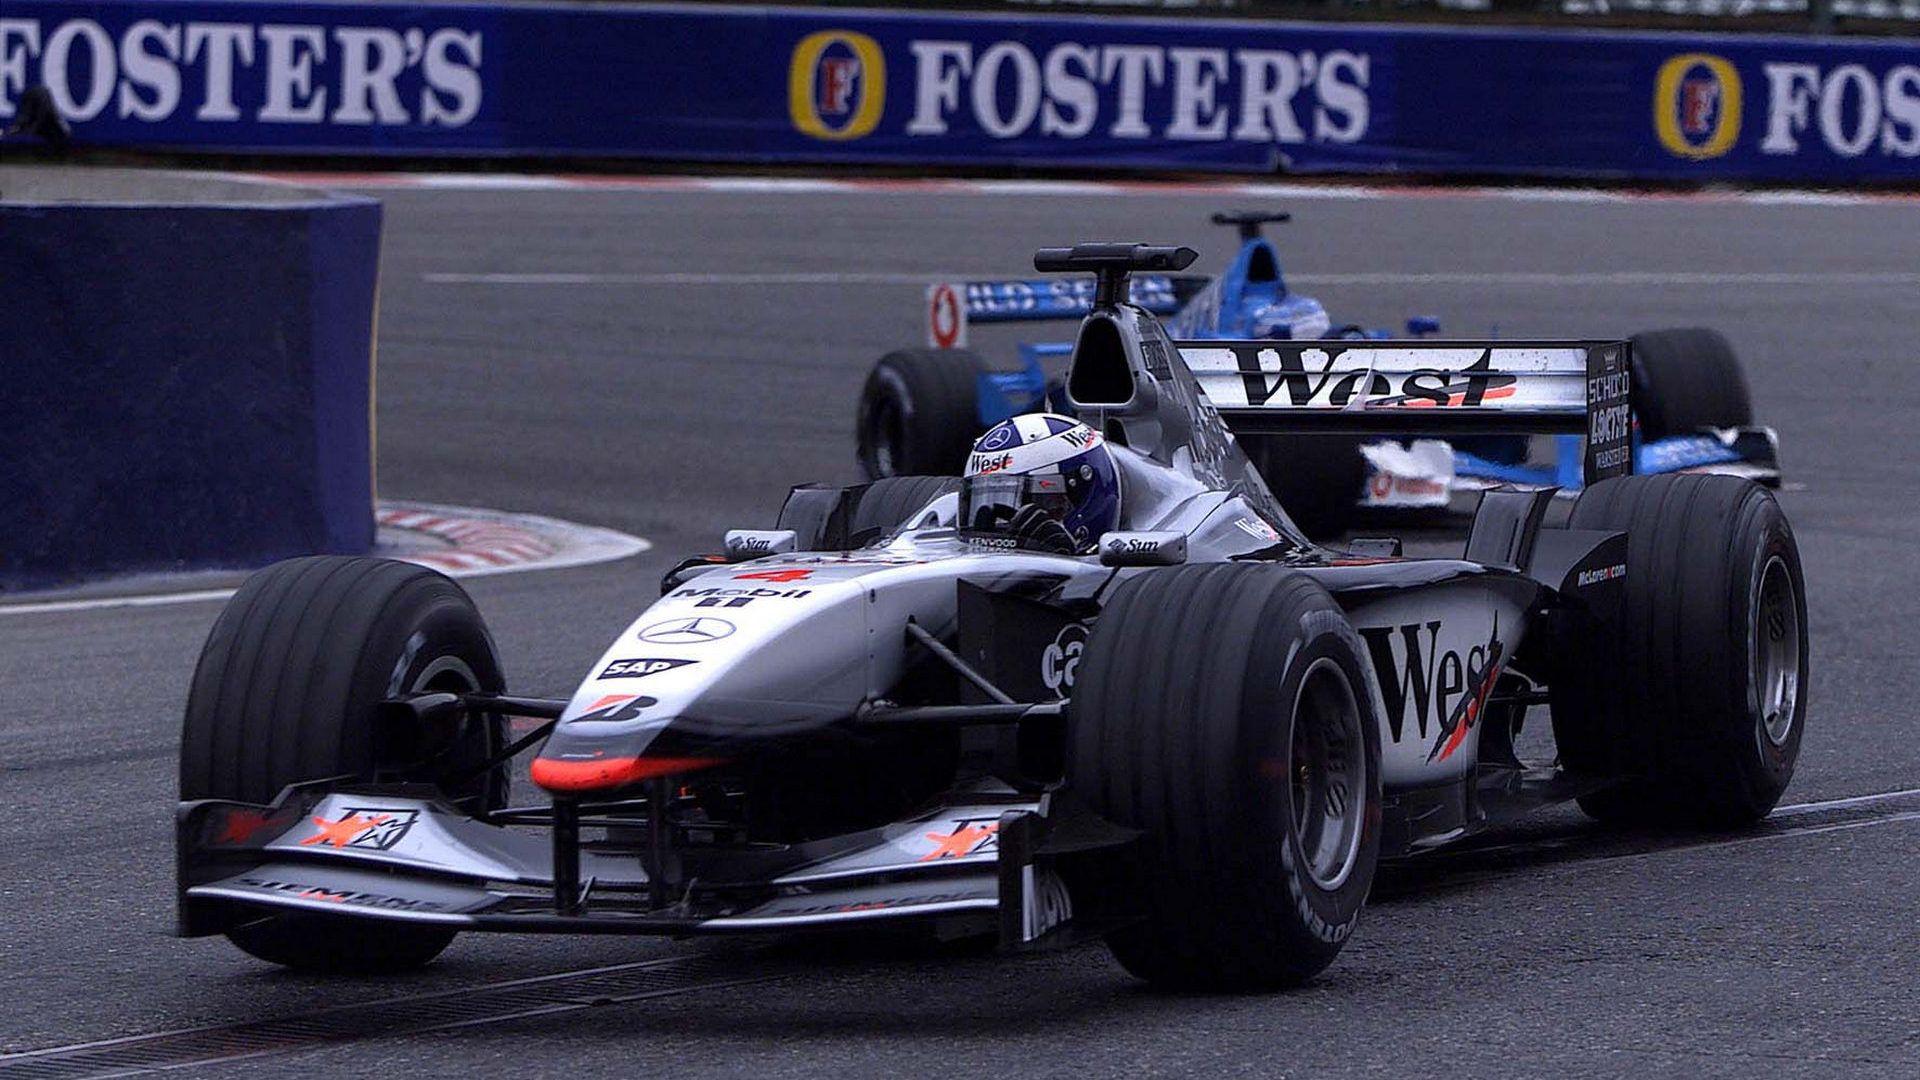 david coulthard - mclaren mp4-16 - 2001 | formula 1 | pinterest